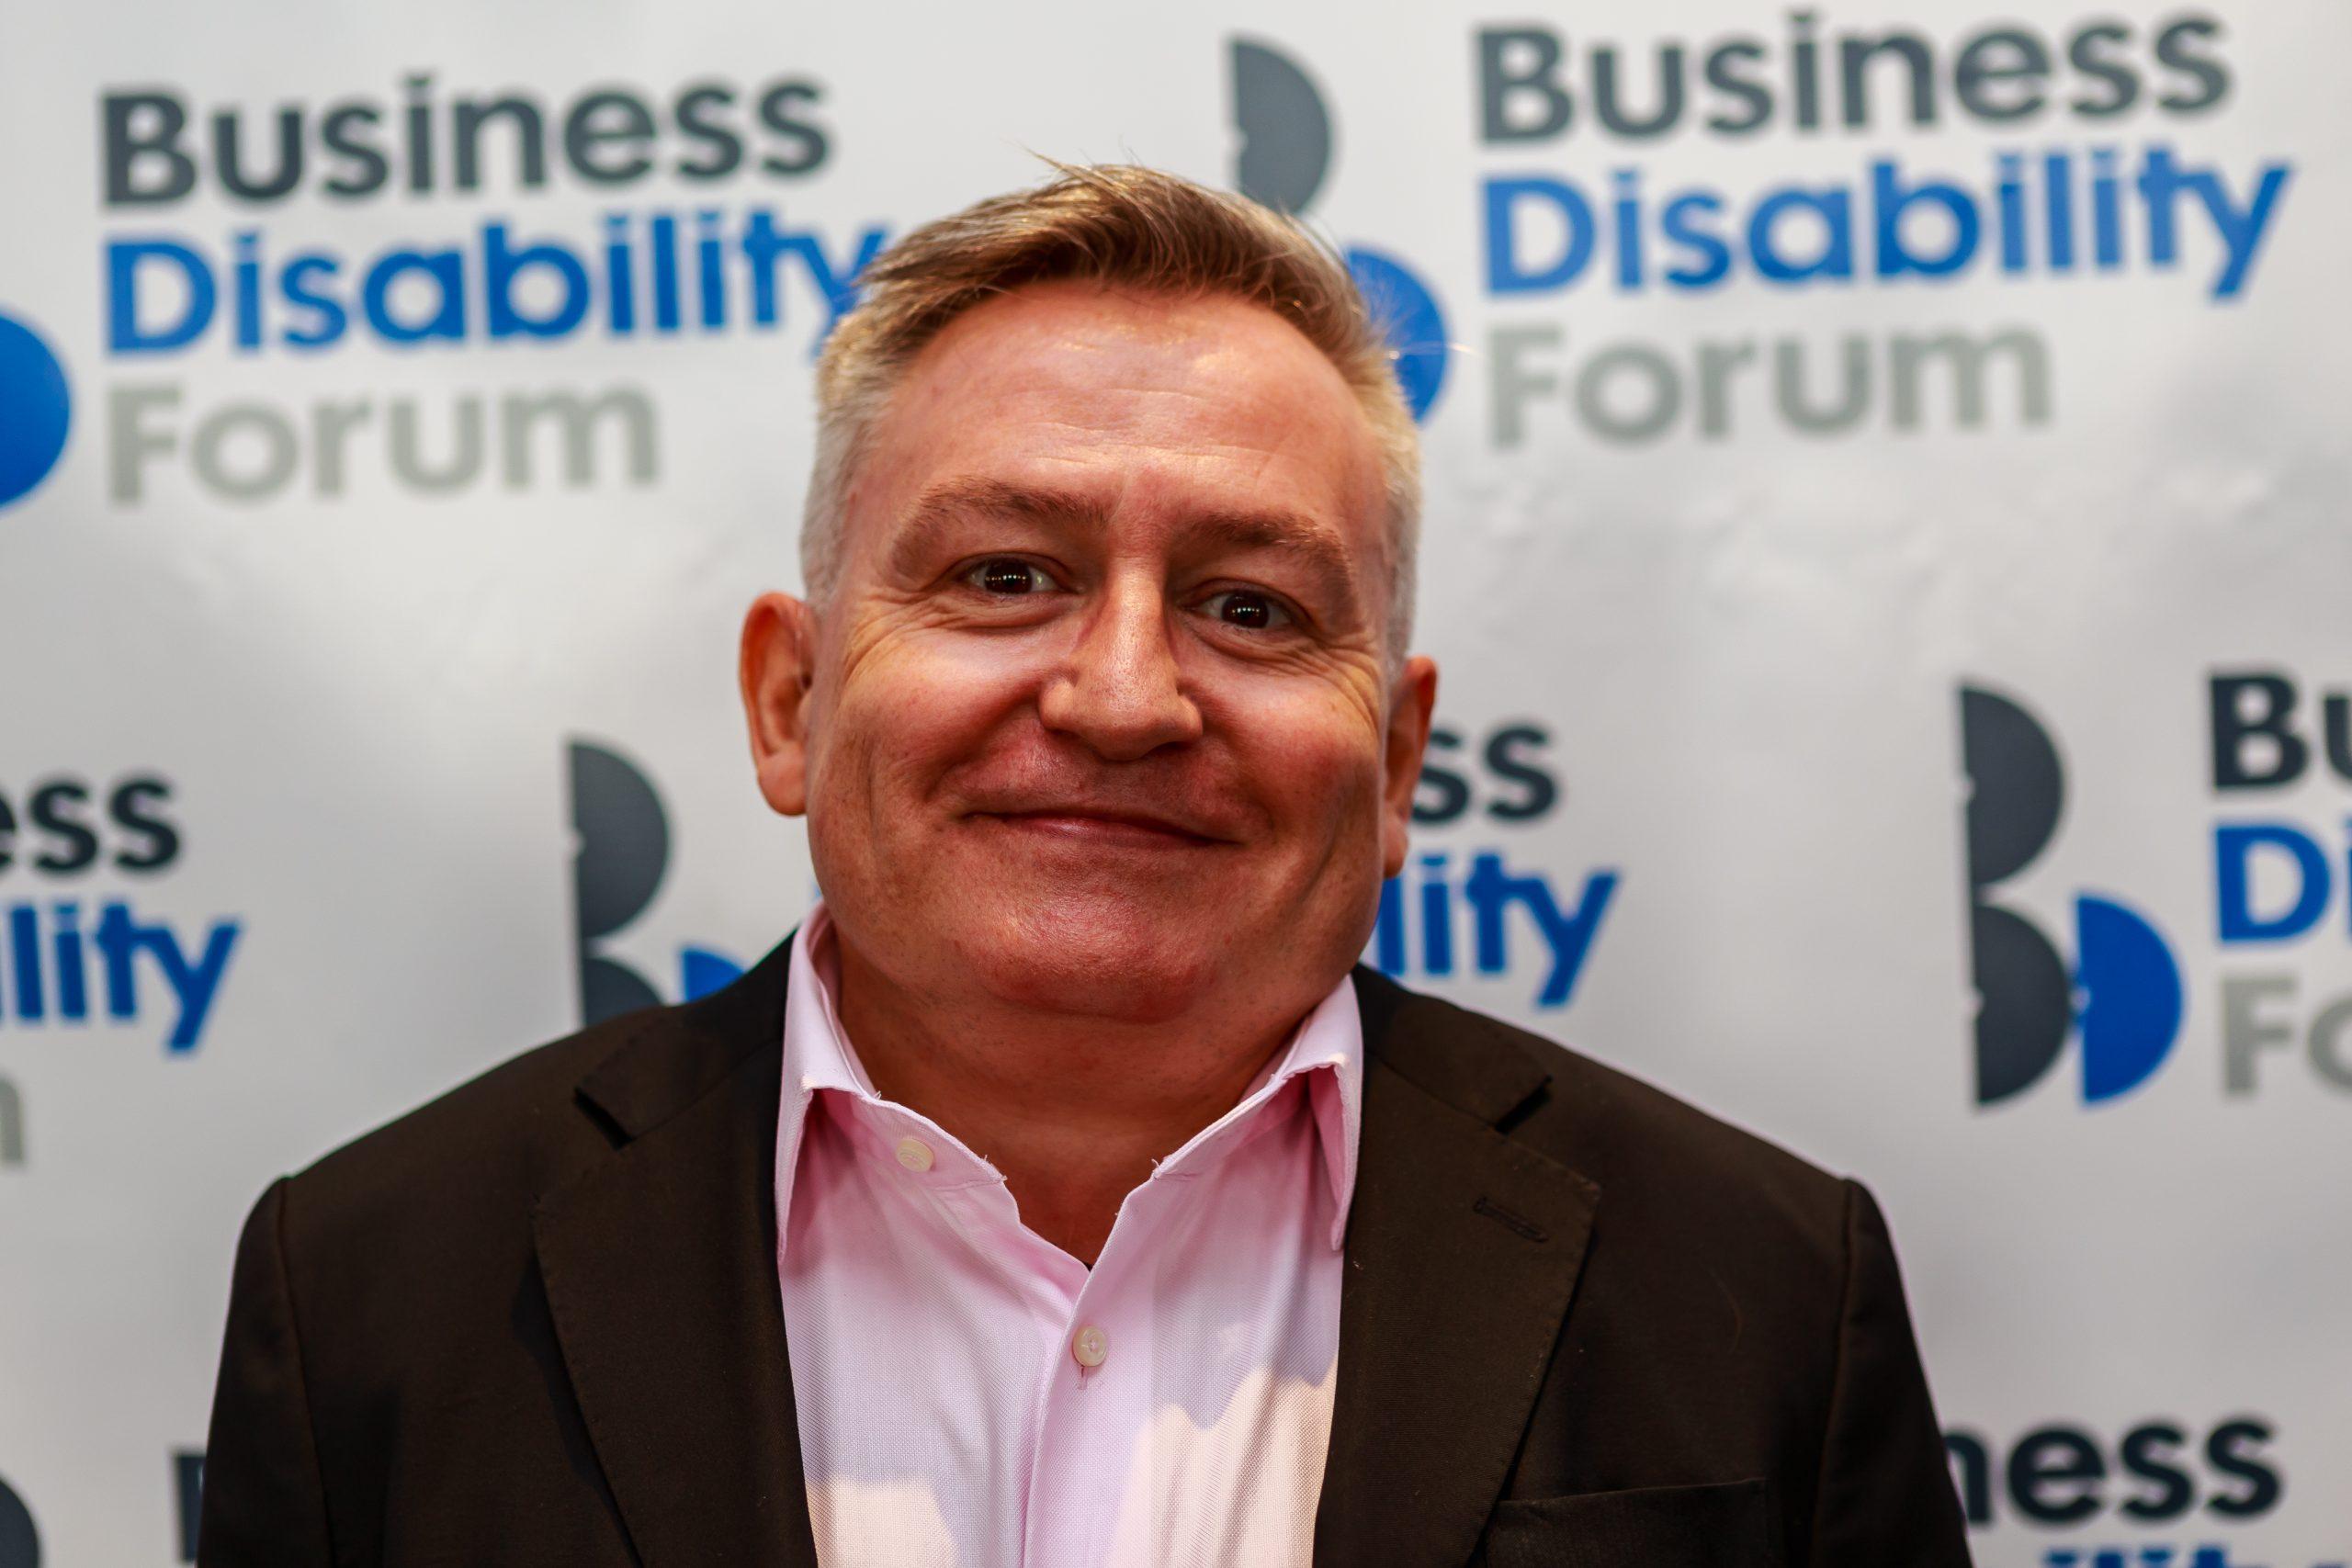 Simon Minty, Business Disability Forum Associate